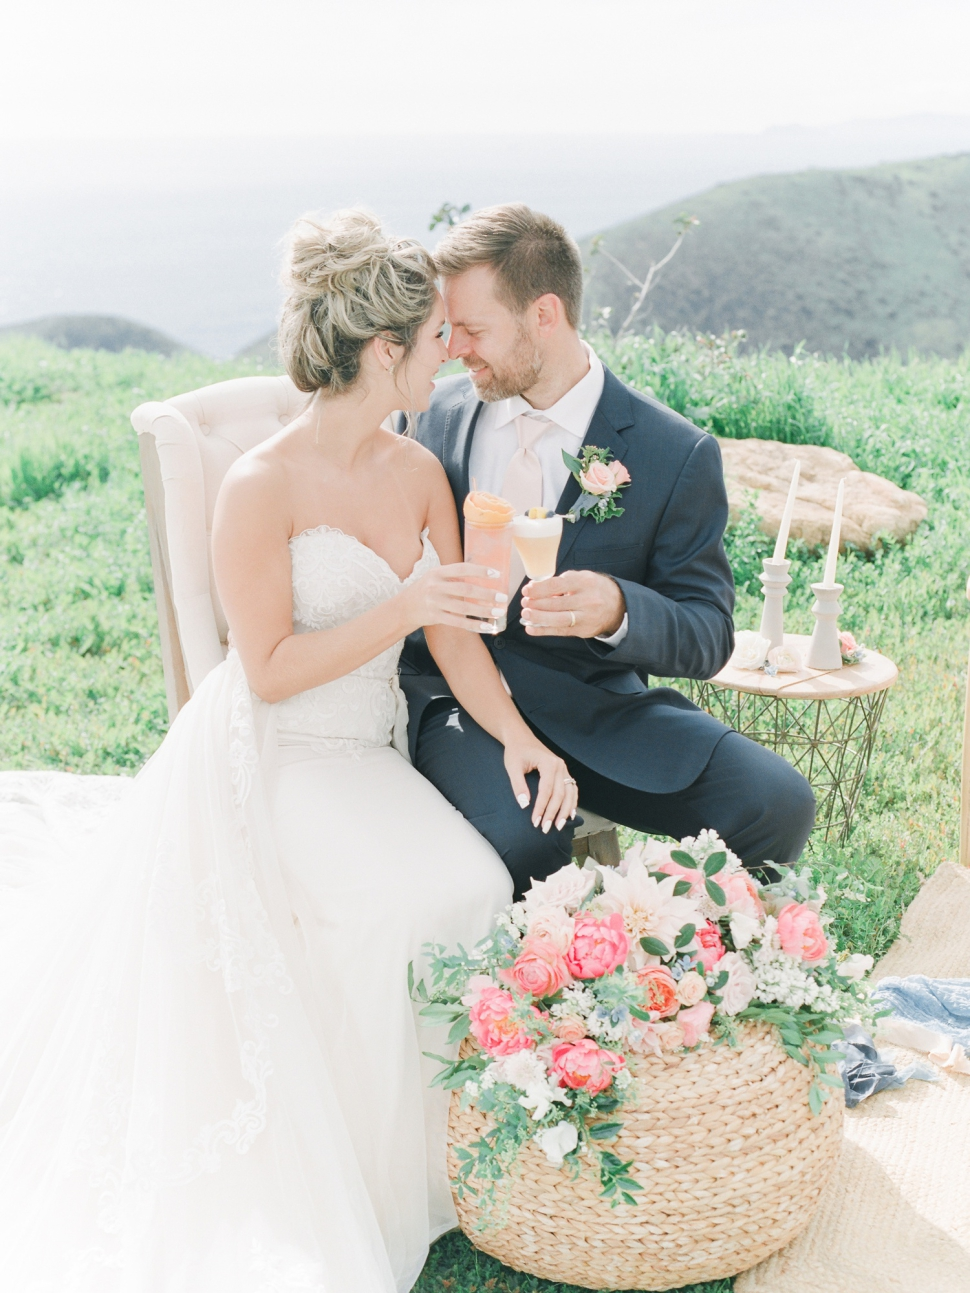 Southern-California-Malibu-Wedding-Photographer-Cassi-Claire-Deer-Creek-Ridge-Wedding_17.jpg